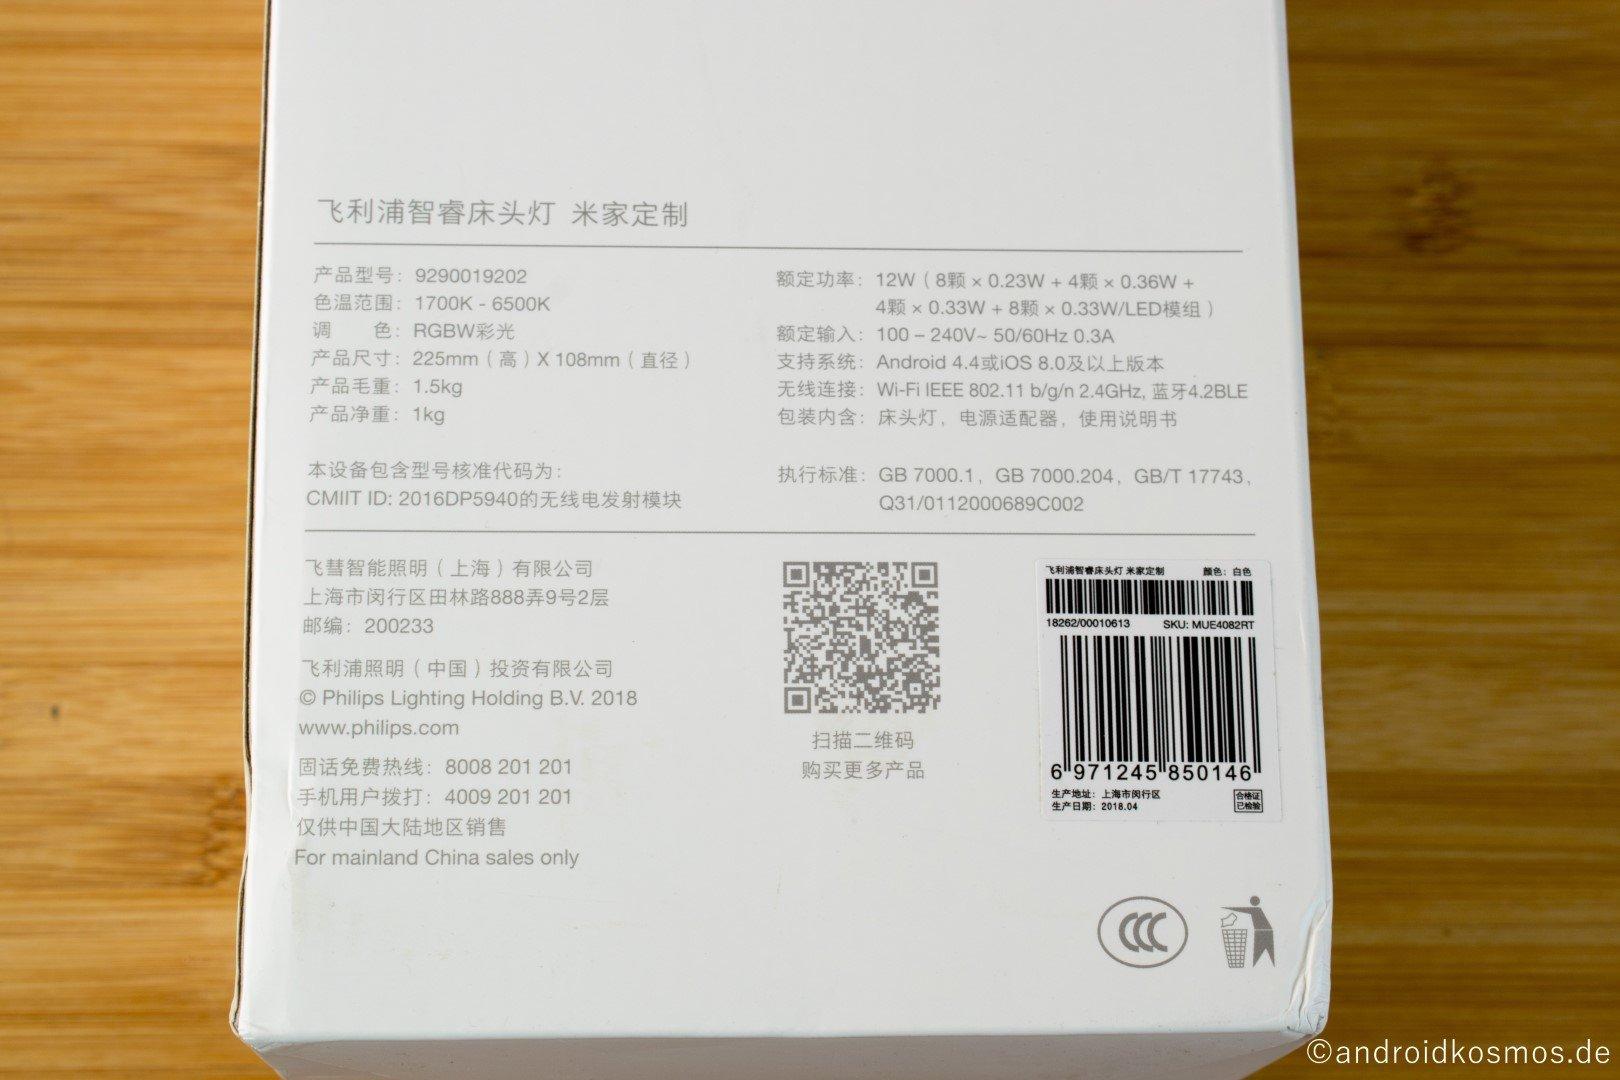 Philips Zhirui AndroidKosmos.de 3630